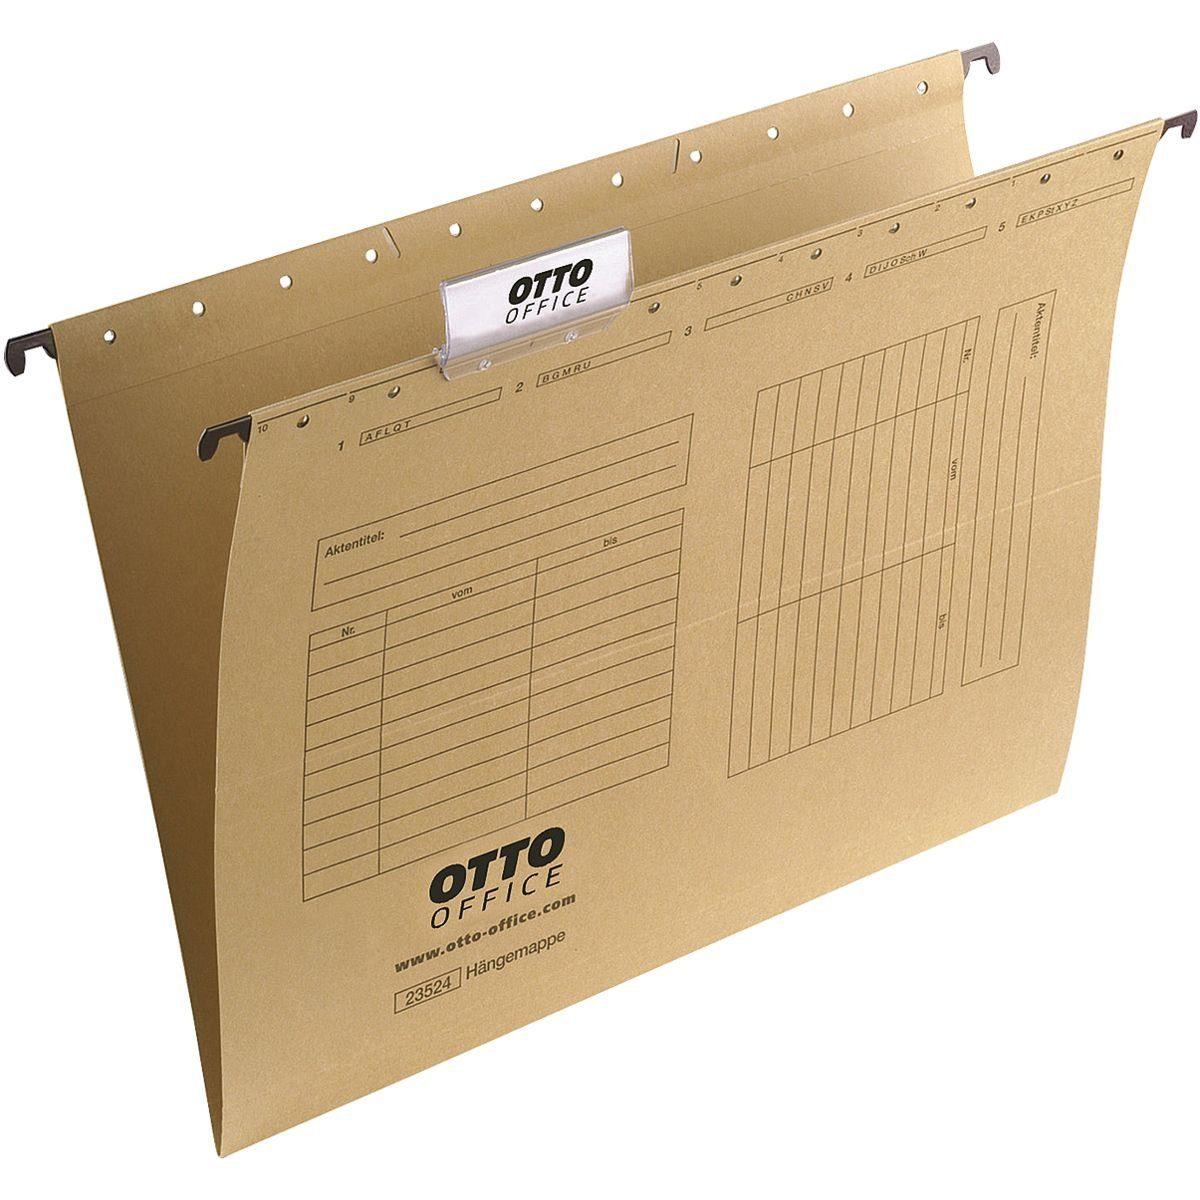 OTTO Office Standard Hängemappen